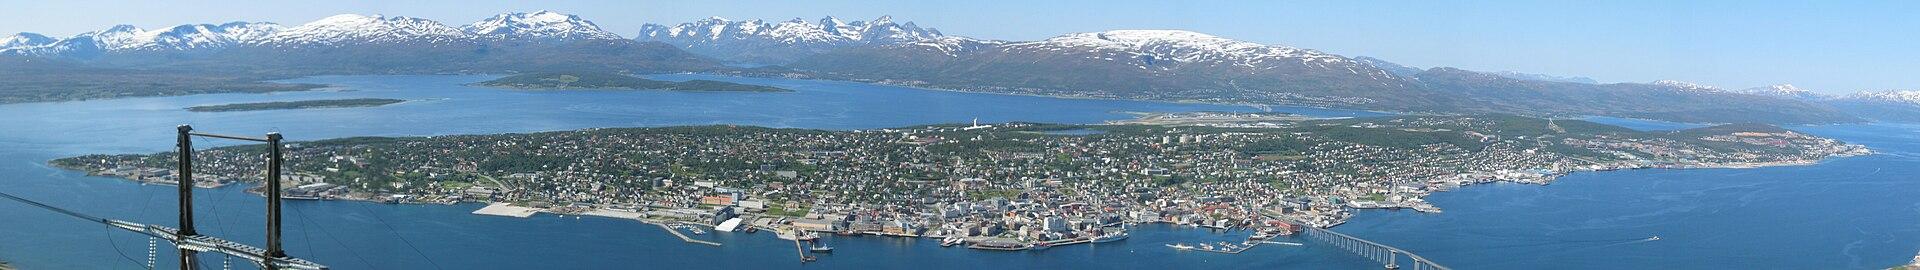 1920px-Troms%C3%B8,_Norway.jpg